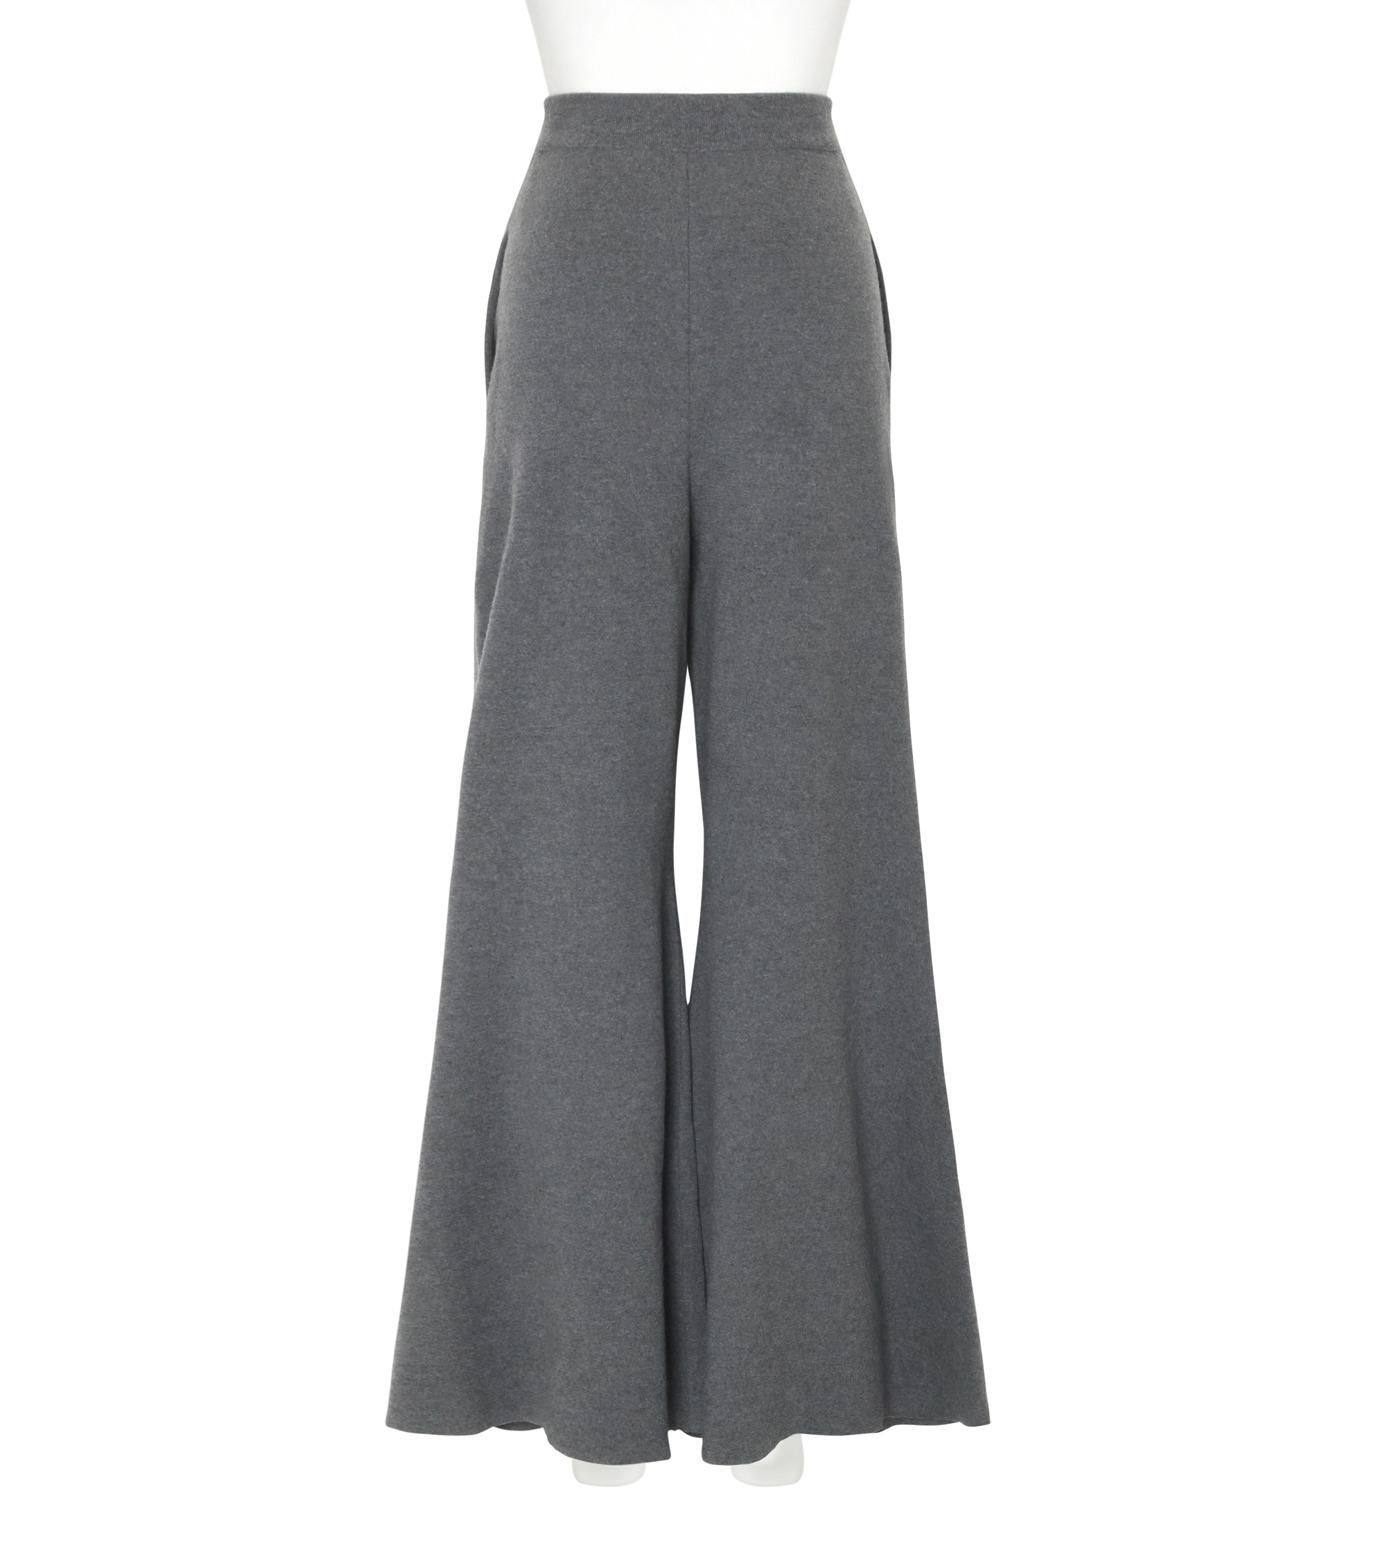 Stella McCartney(ステラマッカートニー)のDeconstructed Knit Wide Pants-CHARCHOL GRAY(パンツ/pants)-441537-S1729-12 拡大詳細画像2